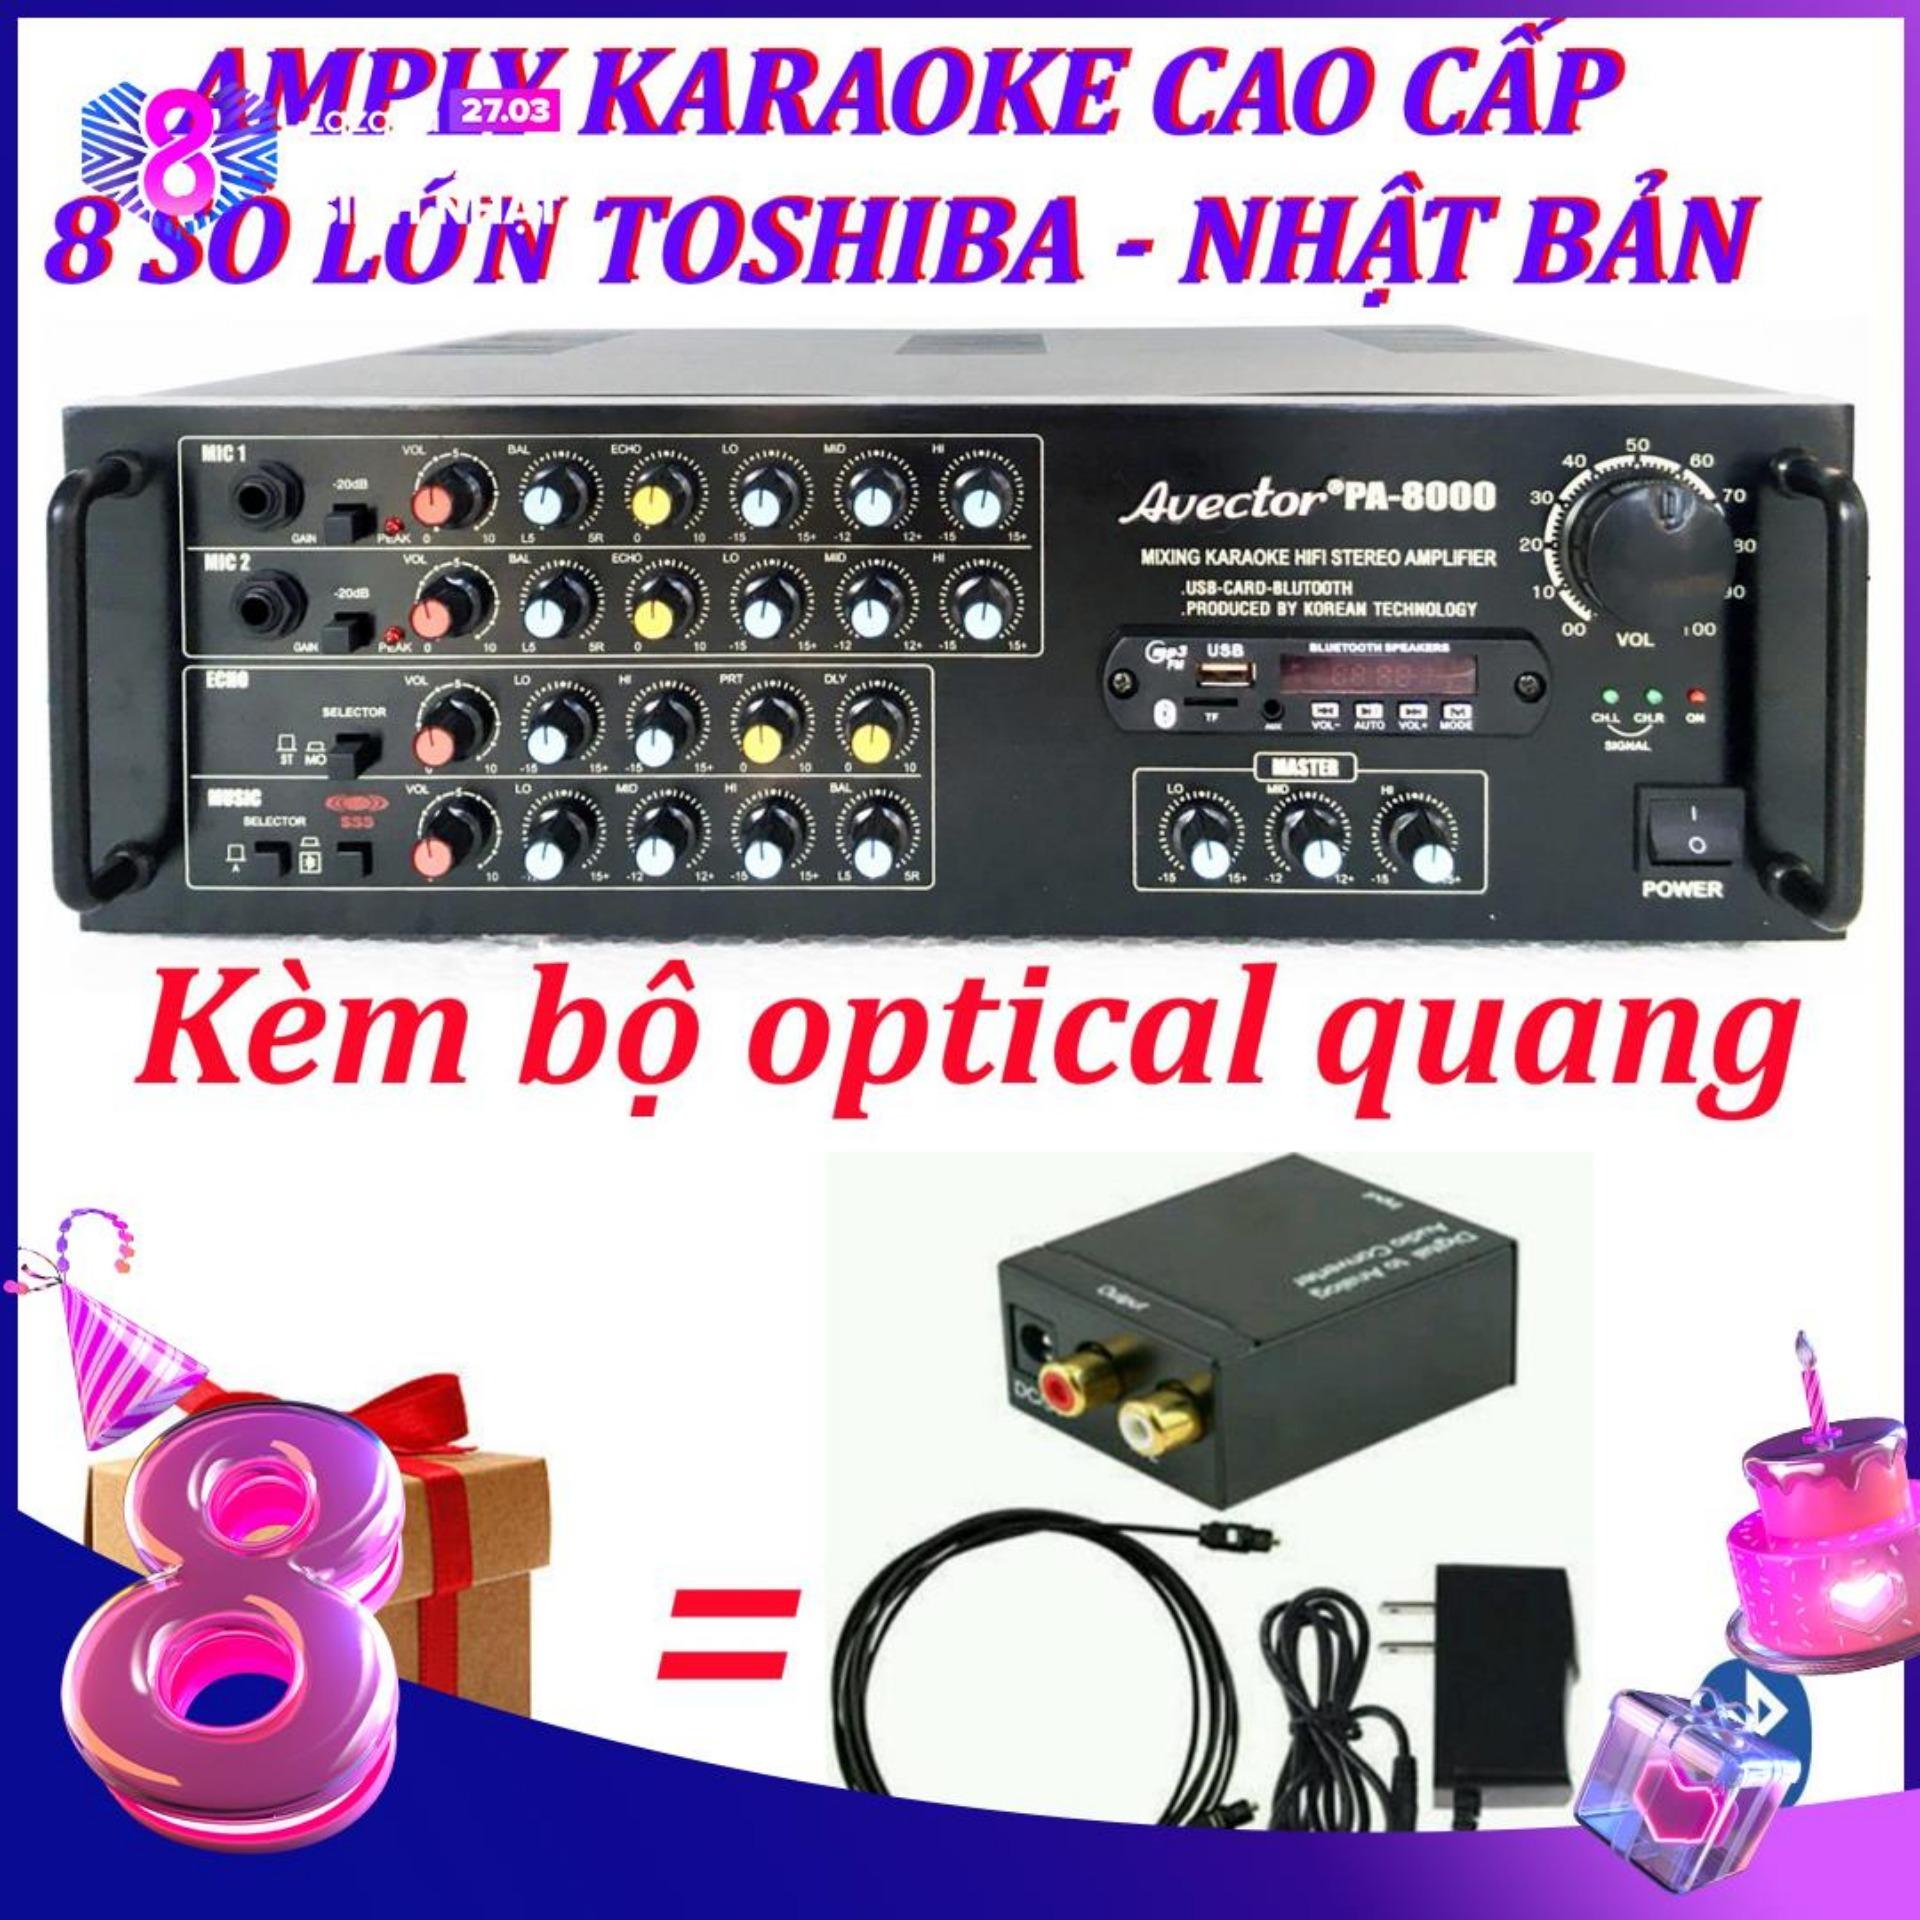 Amply karaoke ampli karaoke amply bluetooth nghe nhạc amply hat karaoke AVECTOR 8000 kèm bộ optical quang